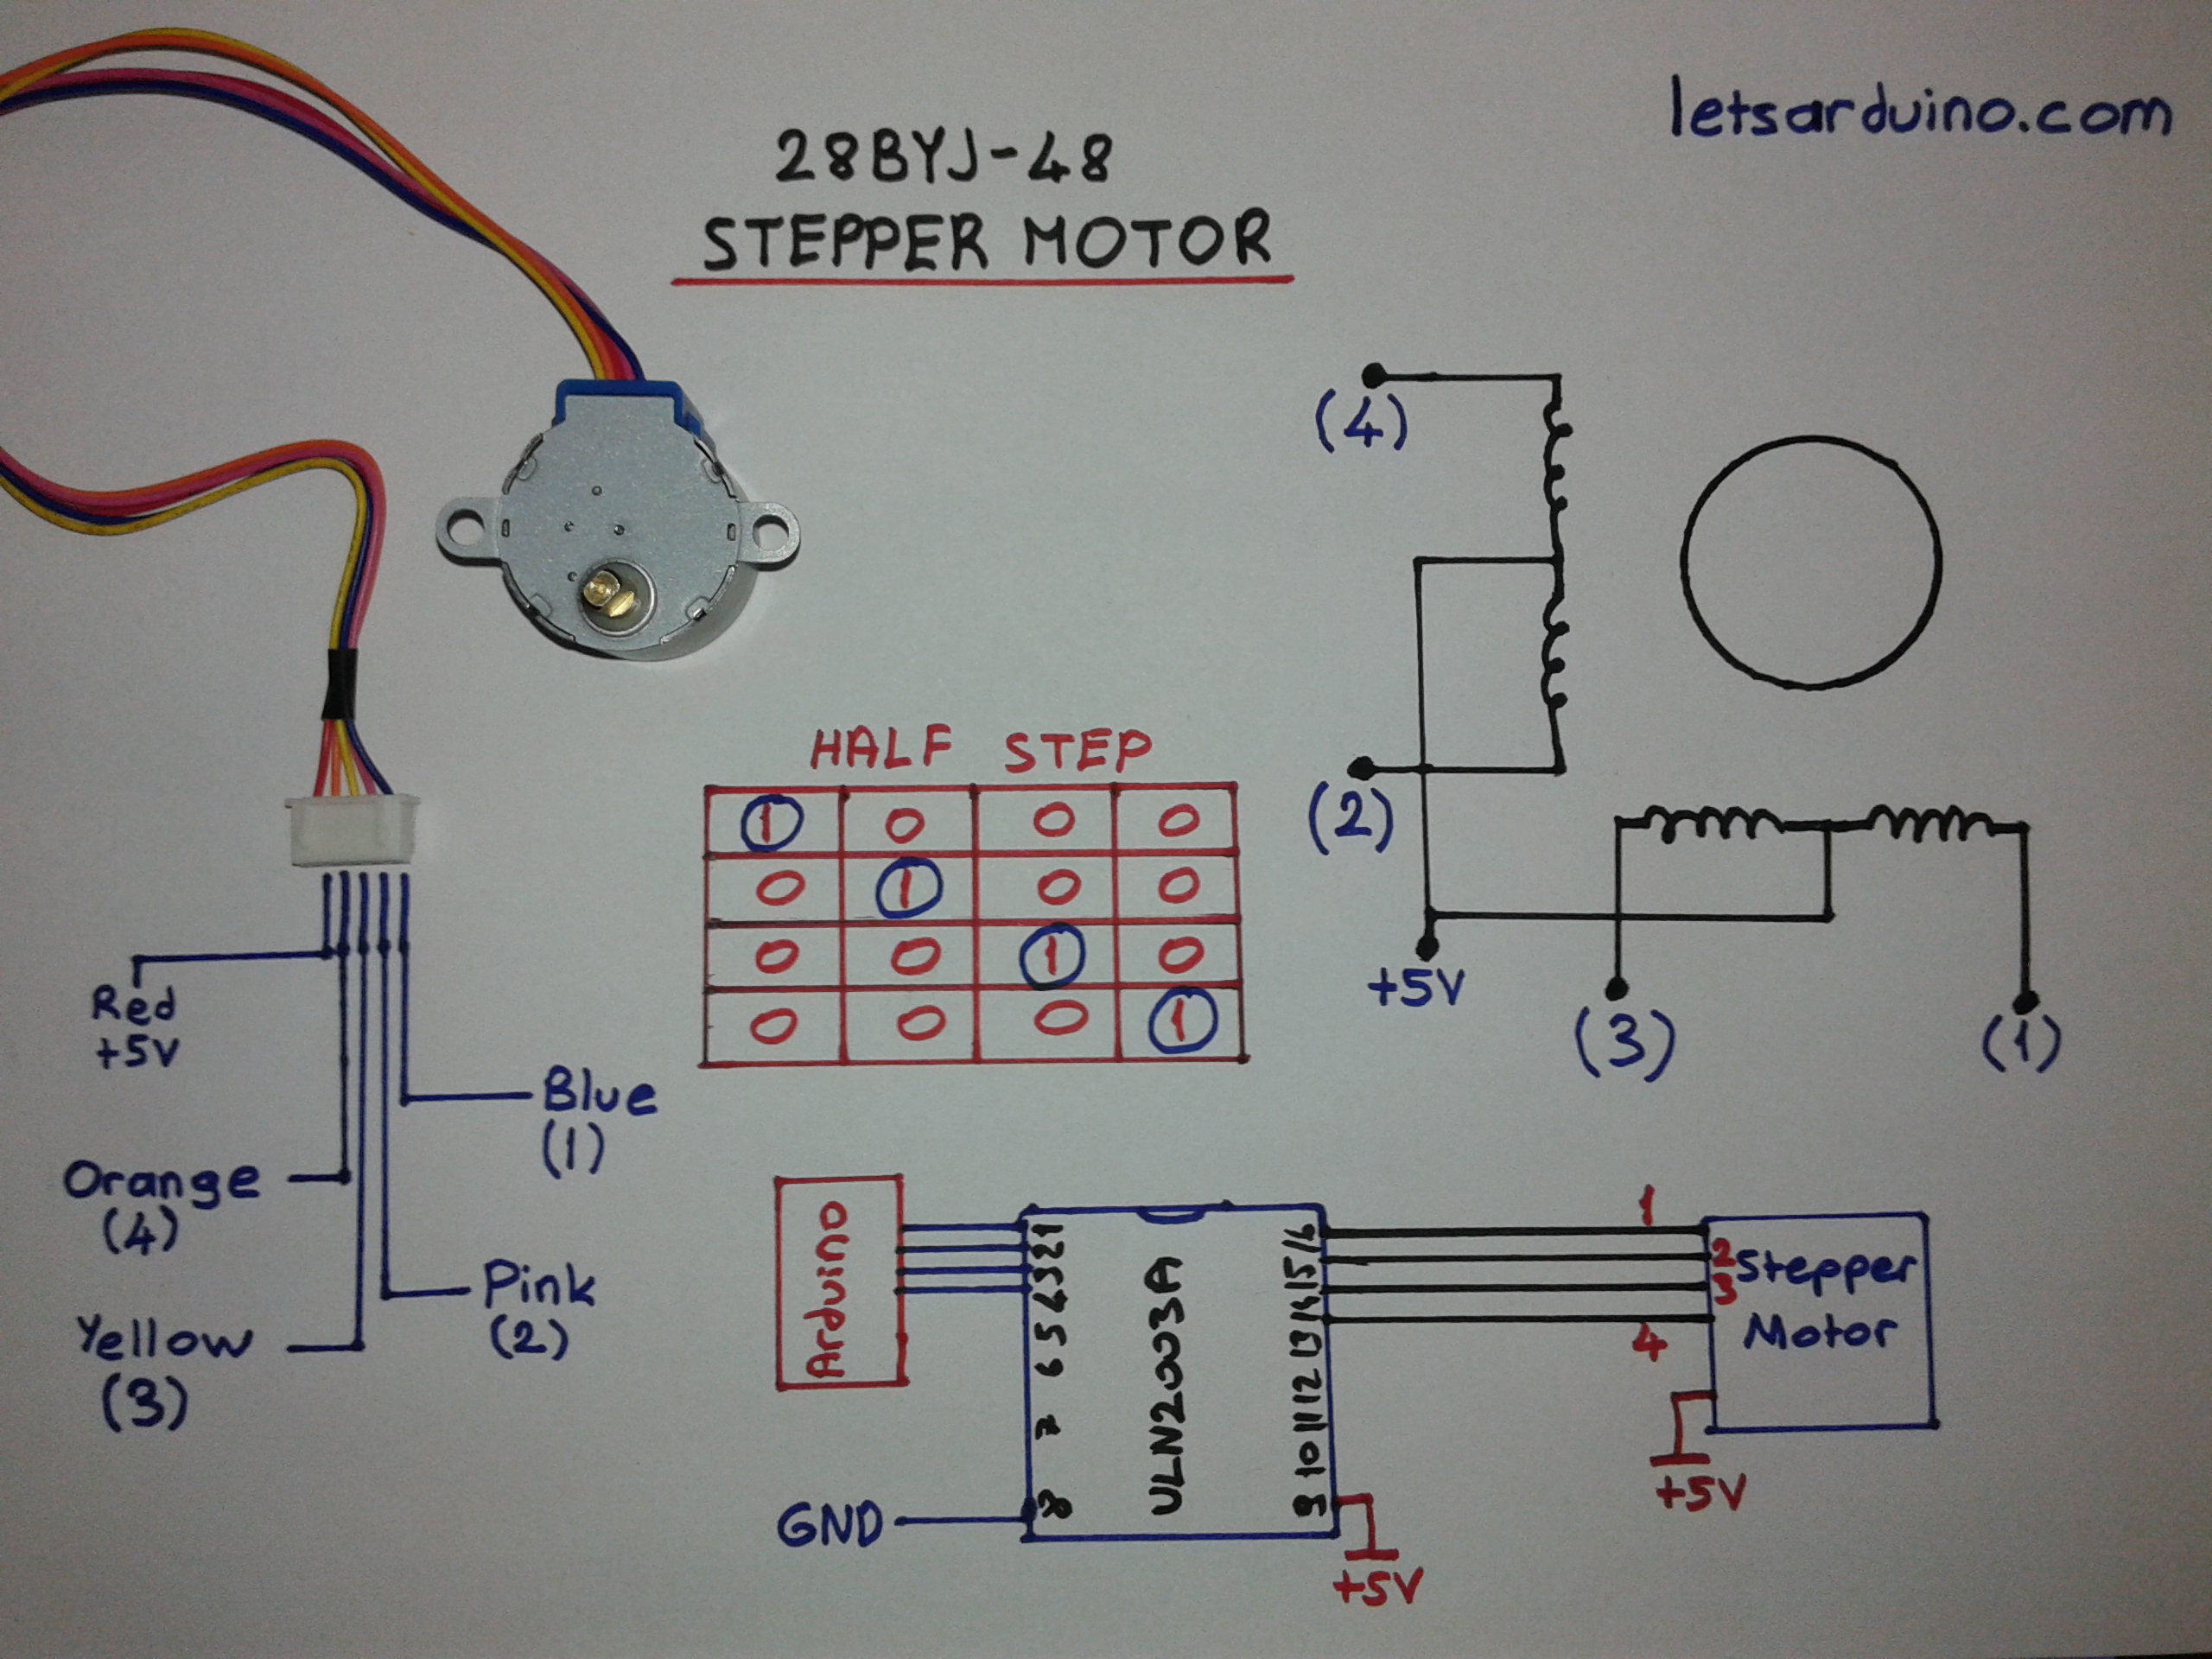 Stepper Motor 28byj 48 Arduino